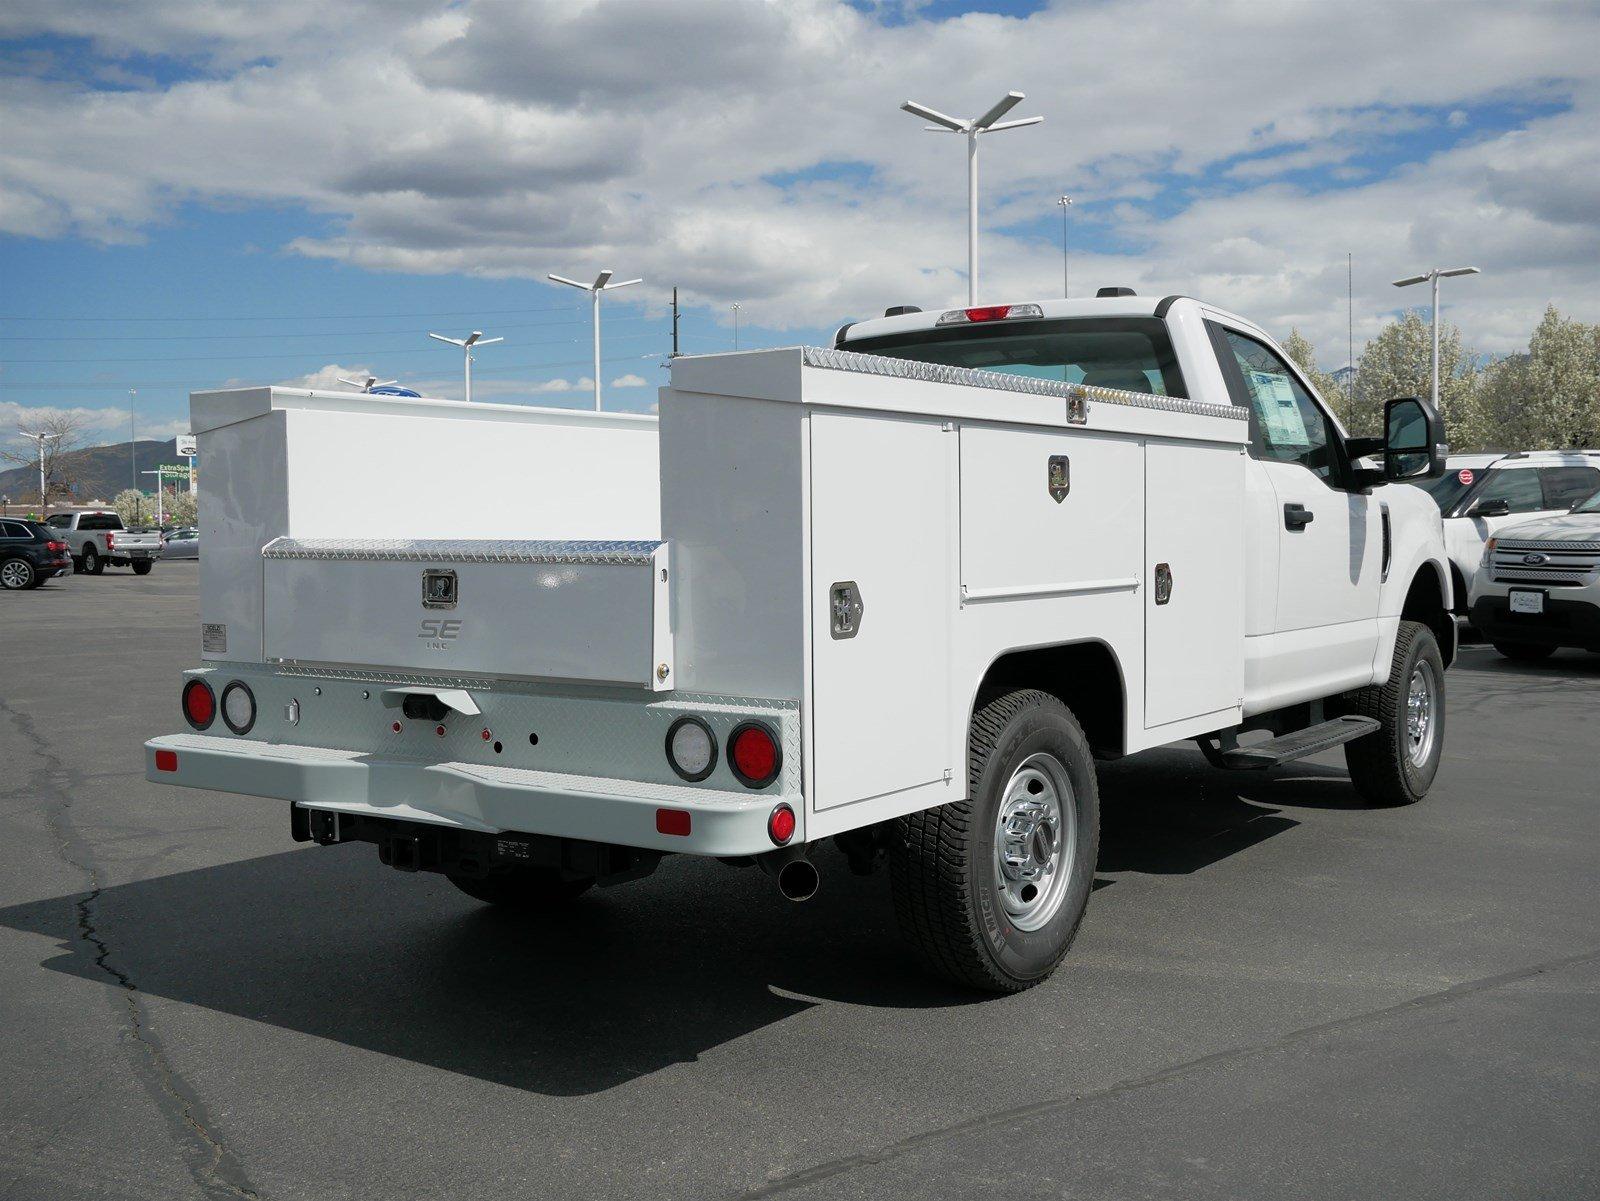 2020 F-250 Regular Cab 4x4, Scelzi Service Body #63107 - photo 1